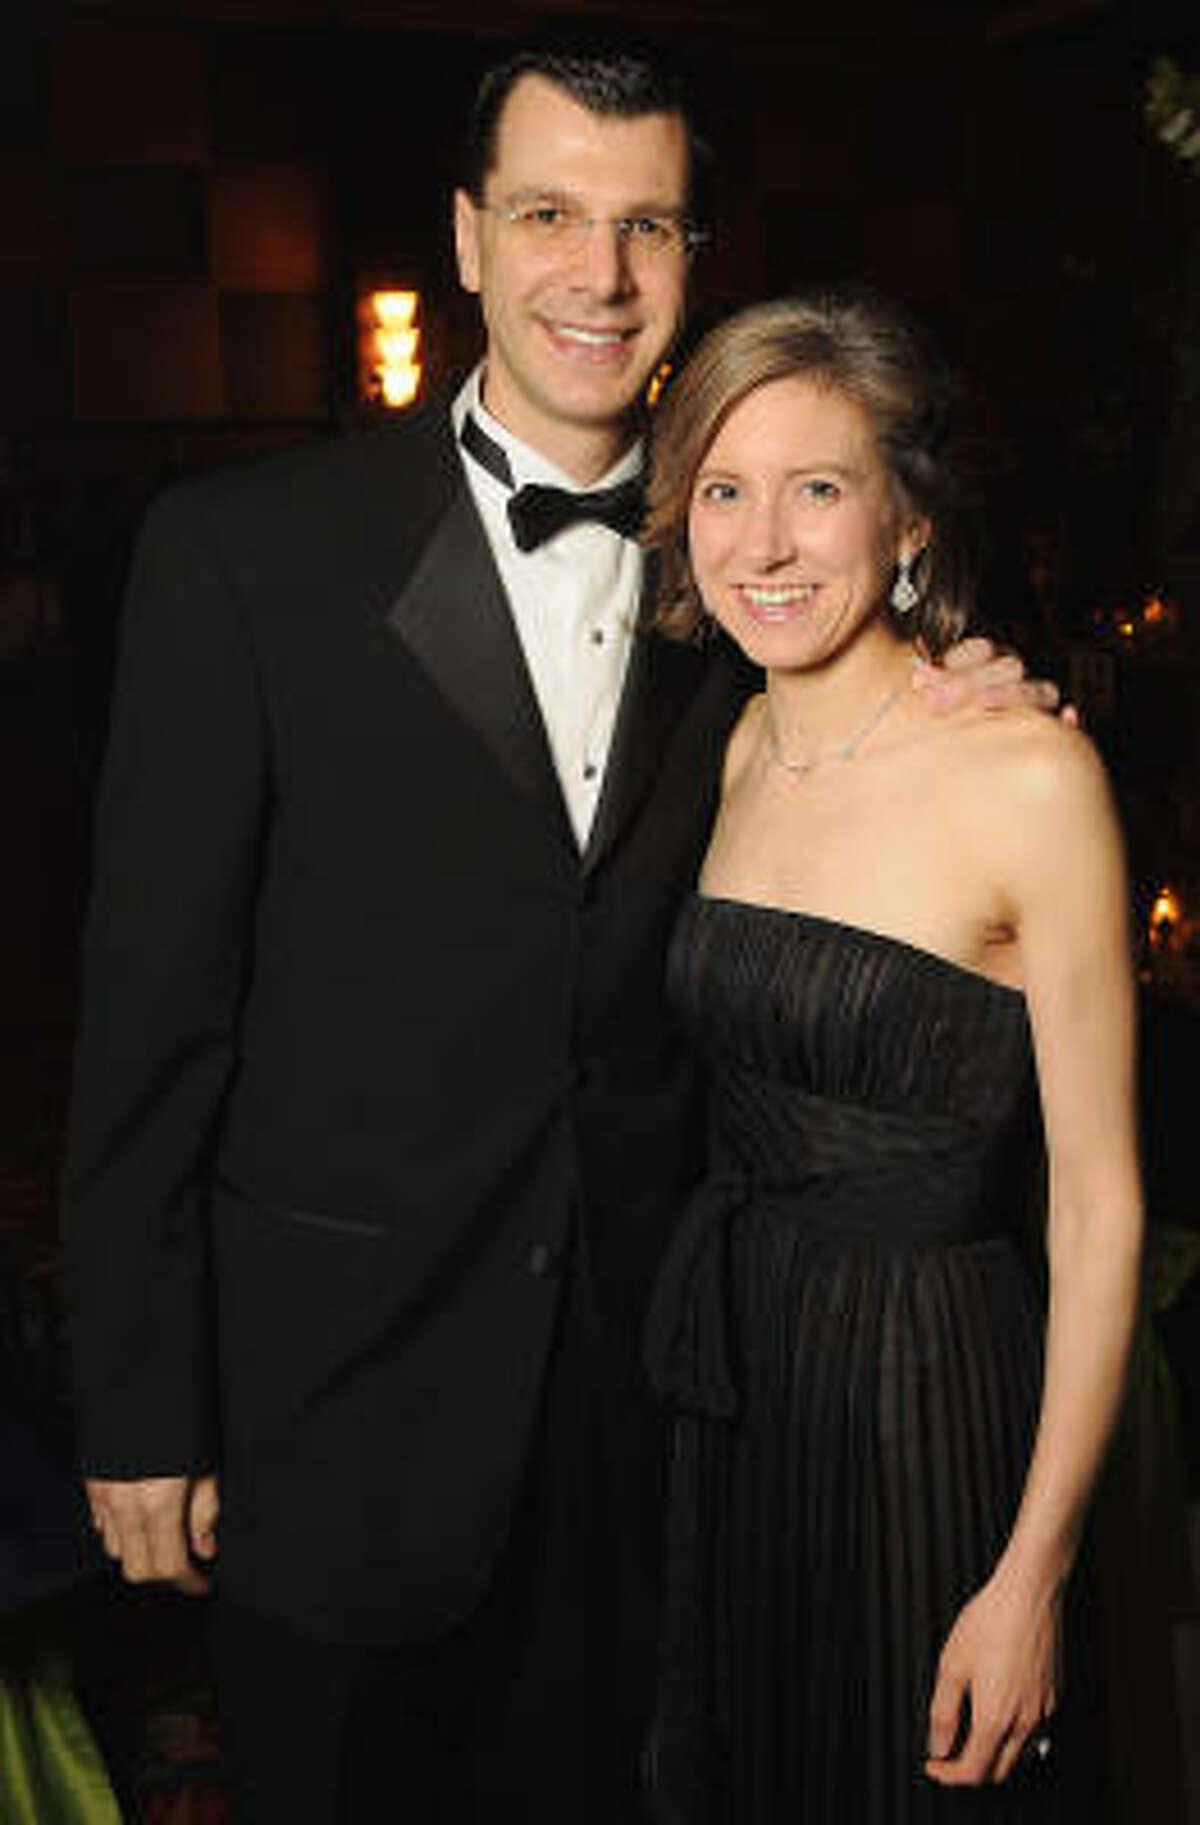 Mark and Christina Hanson